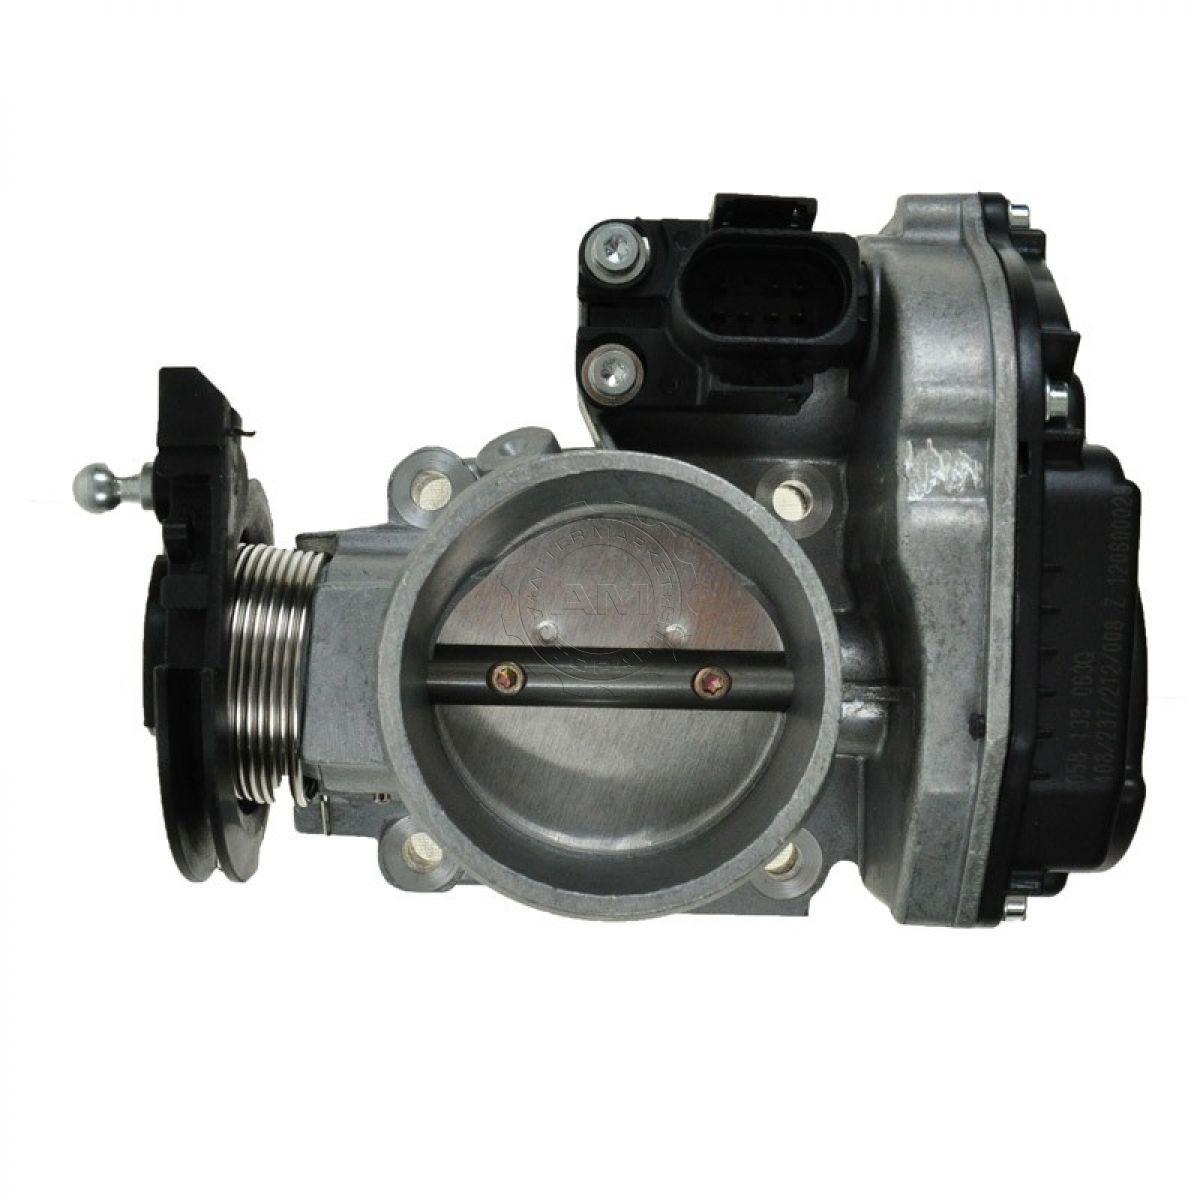 throttle body assembly new for audi a4 vw passat 1 8l turbo ebay rh ebay com Audi A4 Throttle Body Cable 1999 Audi A4